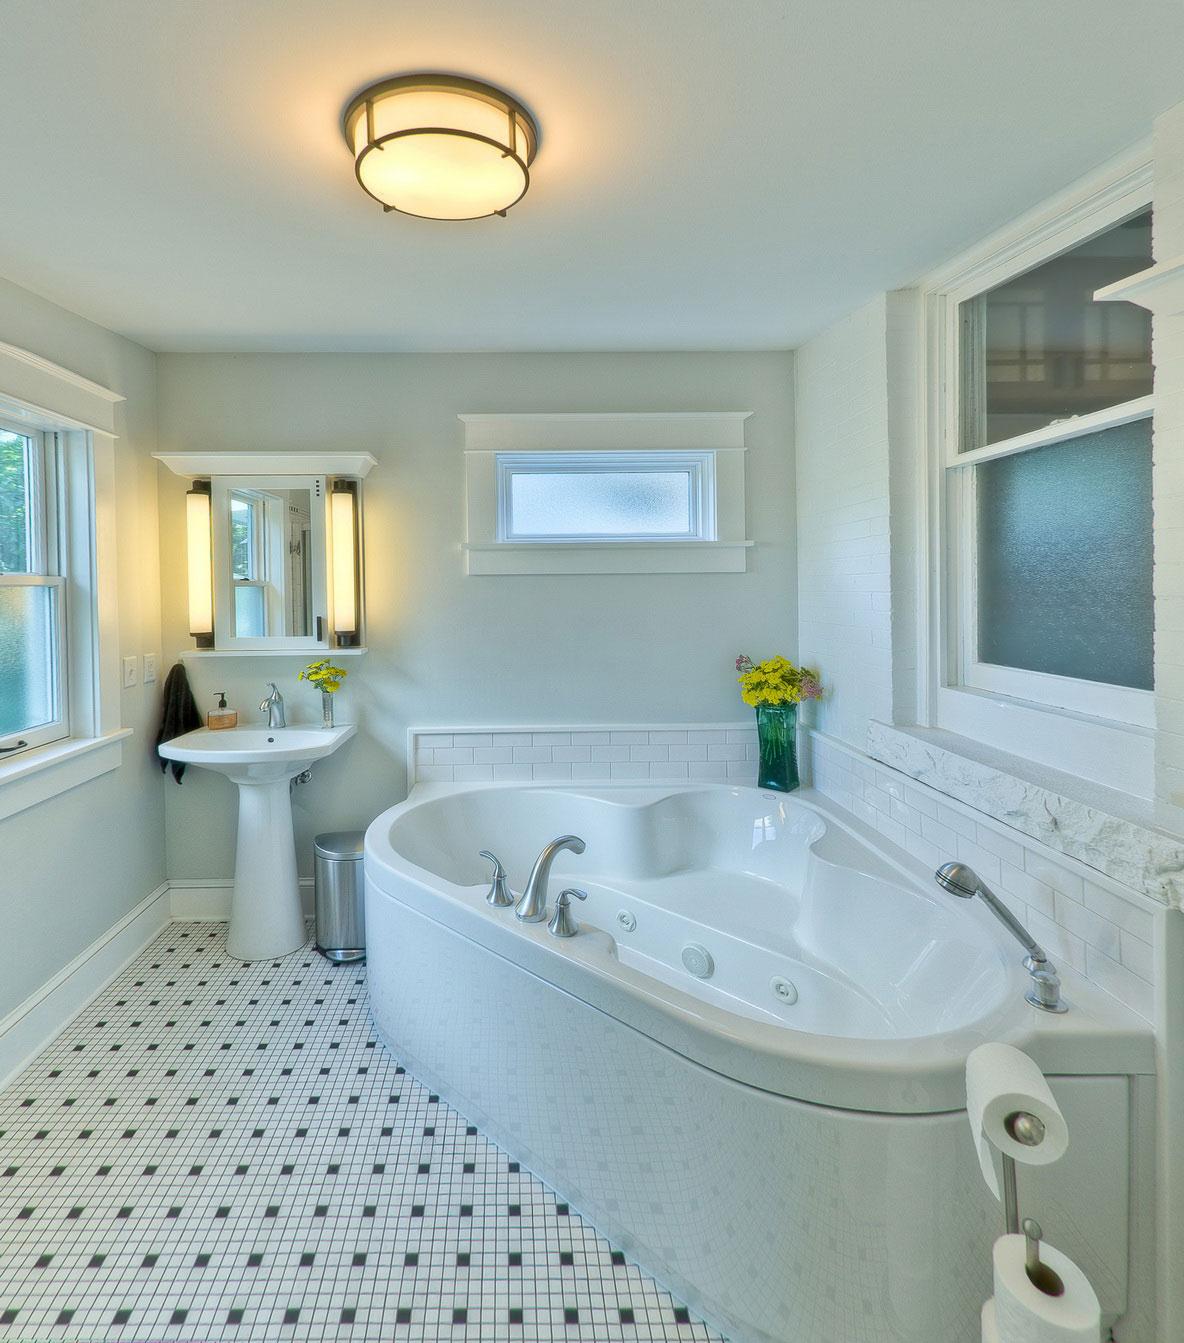 elegance-minimalist-Luxury-bathroom-design-ideas-corner-oval-white-sauna-whirlpool-bathtub-white-acrylic-pedestal-sink-white-wooden-frame-mirrored-front-medicine-cabinet-cylindrical-wall